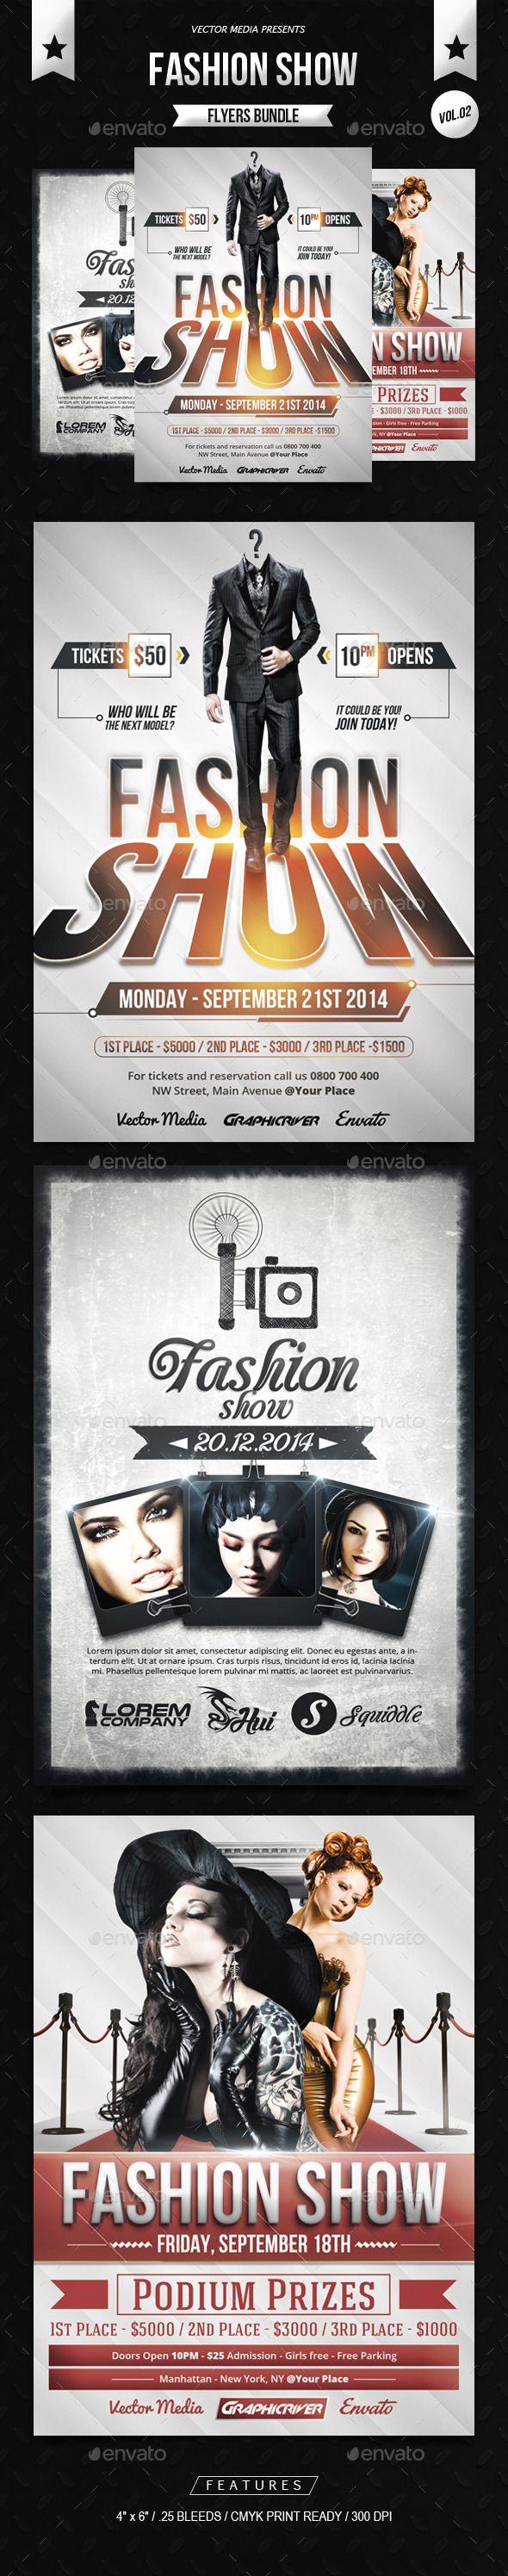 Fashion Show - Flyers Bundle [Vol.02]